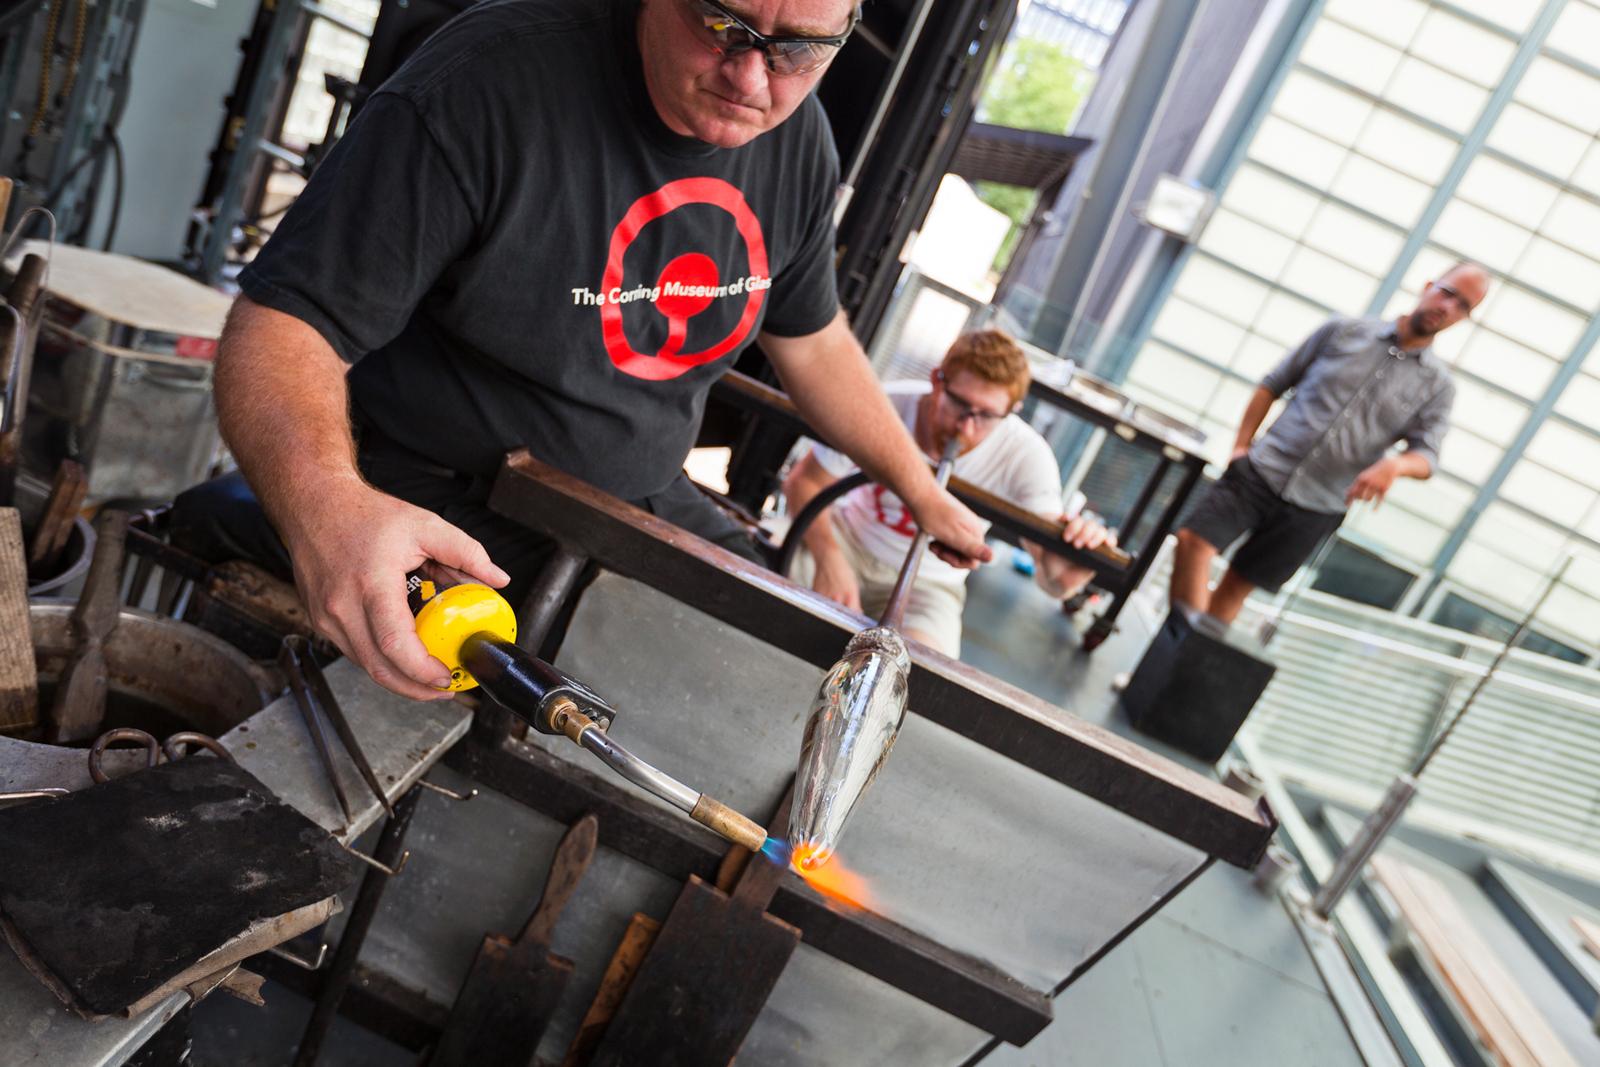 Designer Tom Scott at GlassLab in Corning, July 2012